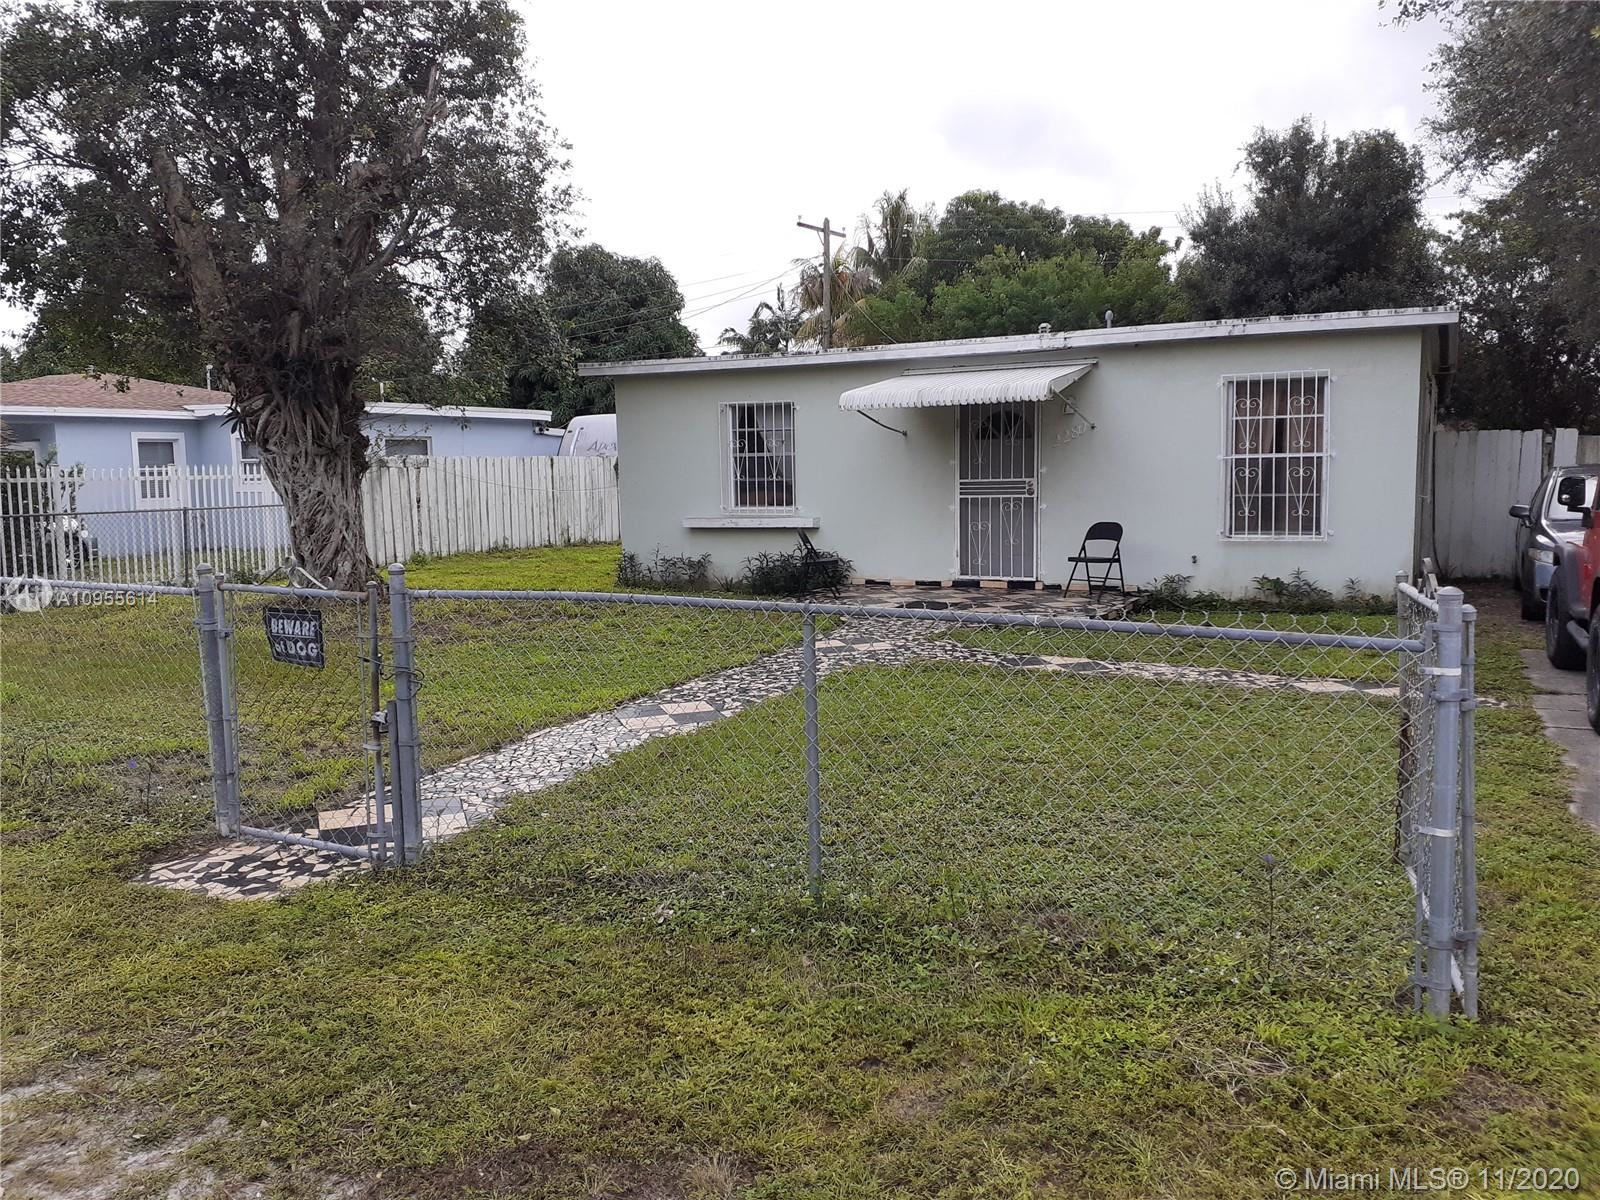 2280 NW 133rd St, Miami, FL 33167 - #: A10955614